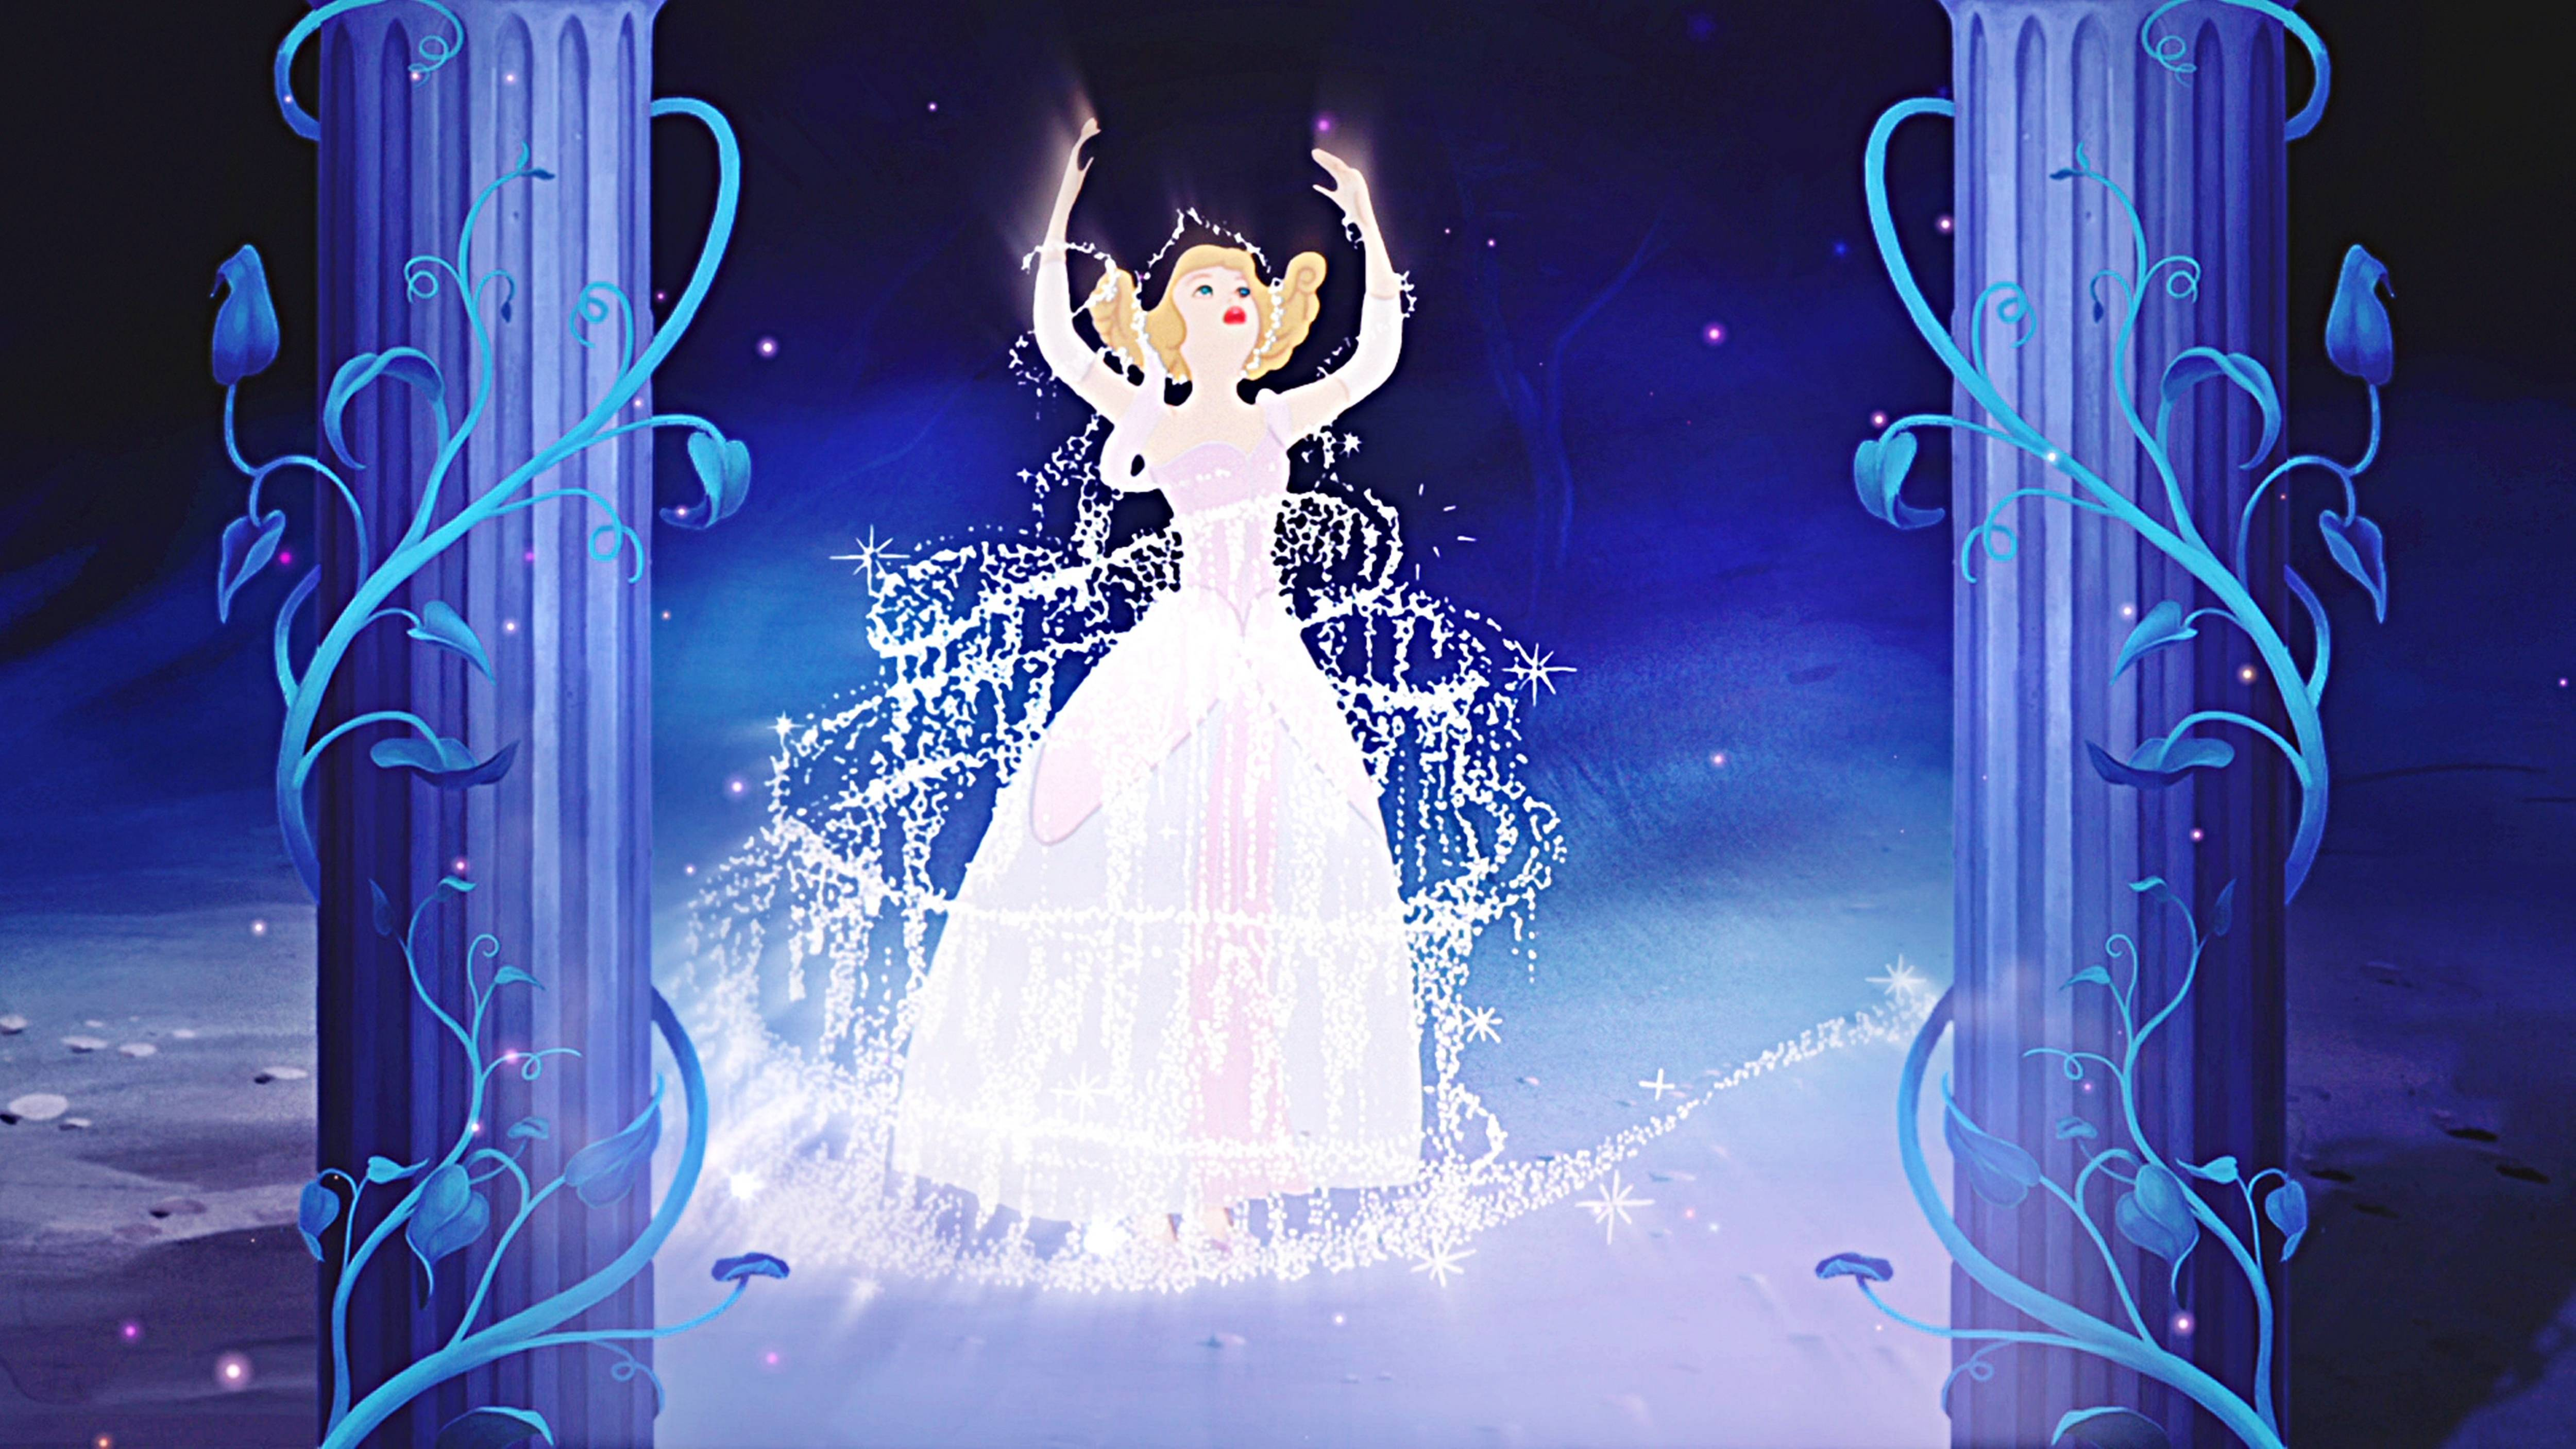 Disney Princess Cinderella Wallpaper For Background